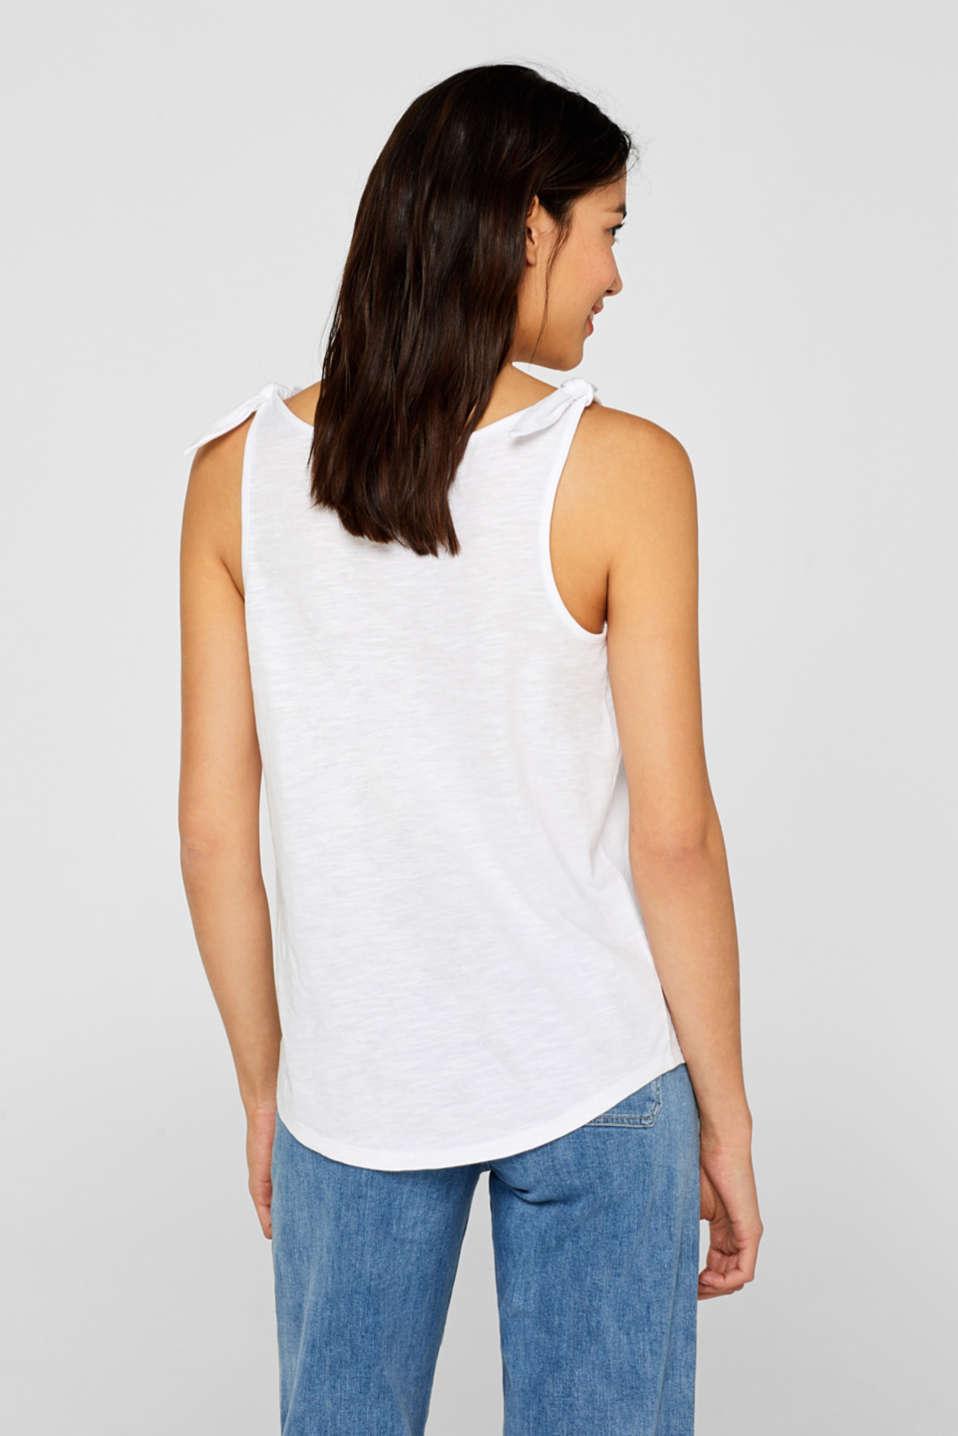 Slub top with bow detail shoulder straps, 100% cotton, WHITE, detail image number 2